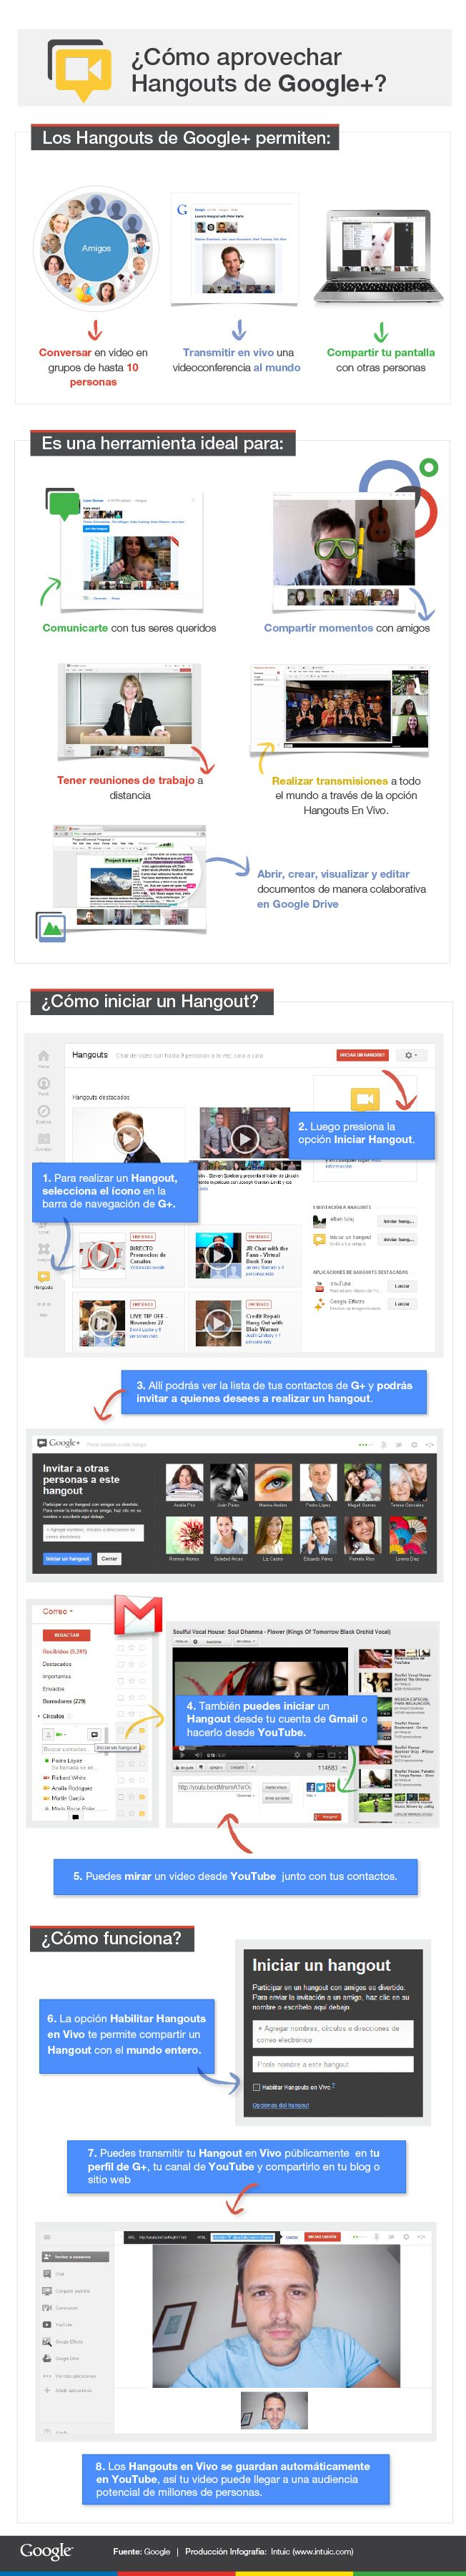 Cómo aprovechar los hangouts de Google + #infografia